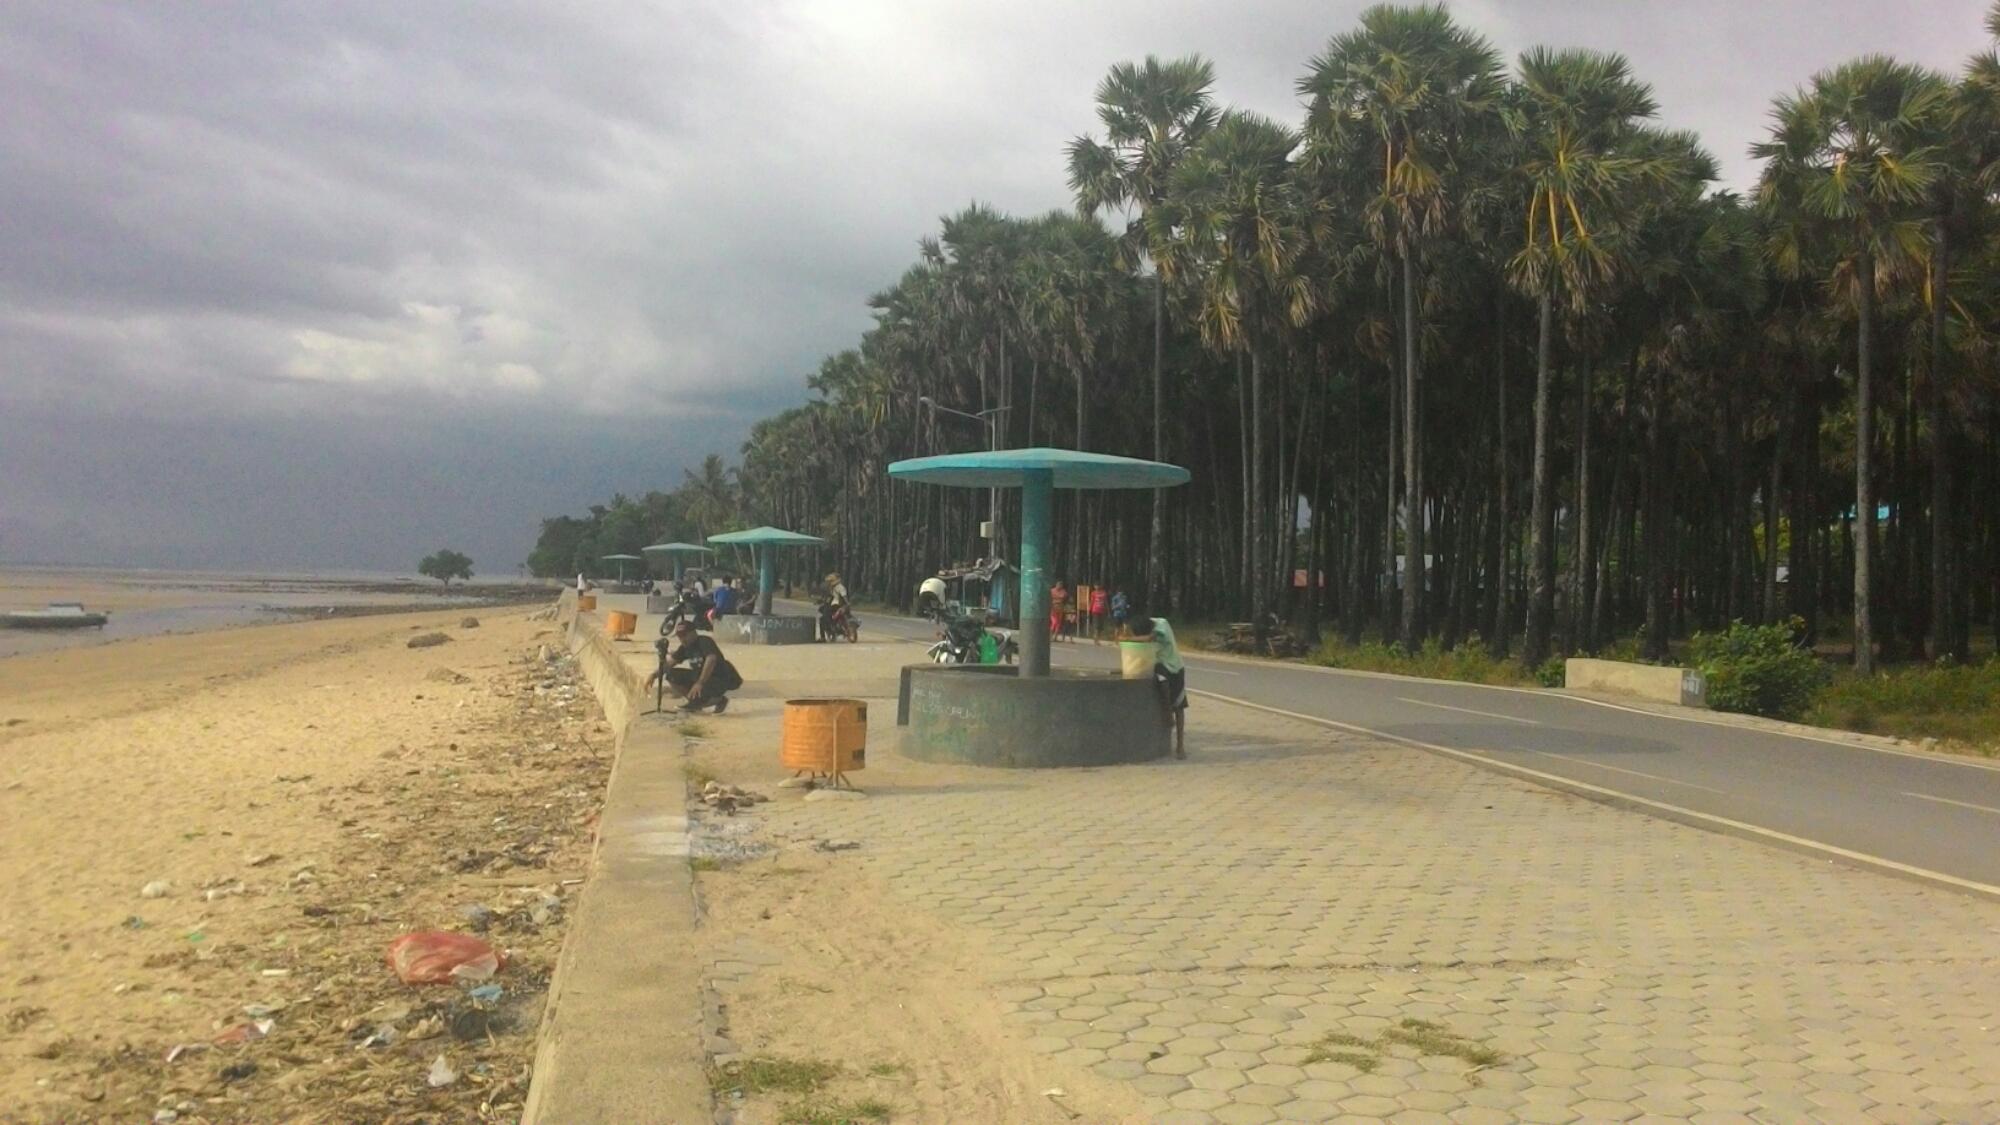 Dua Pantai Tetangga Duc Altum Nunsui Pinggir Jalan Kab Kupang